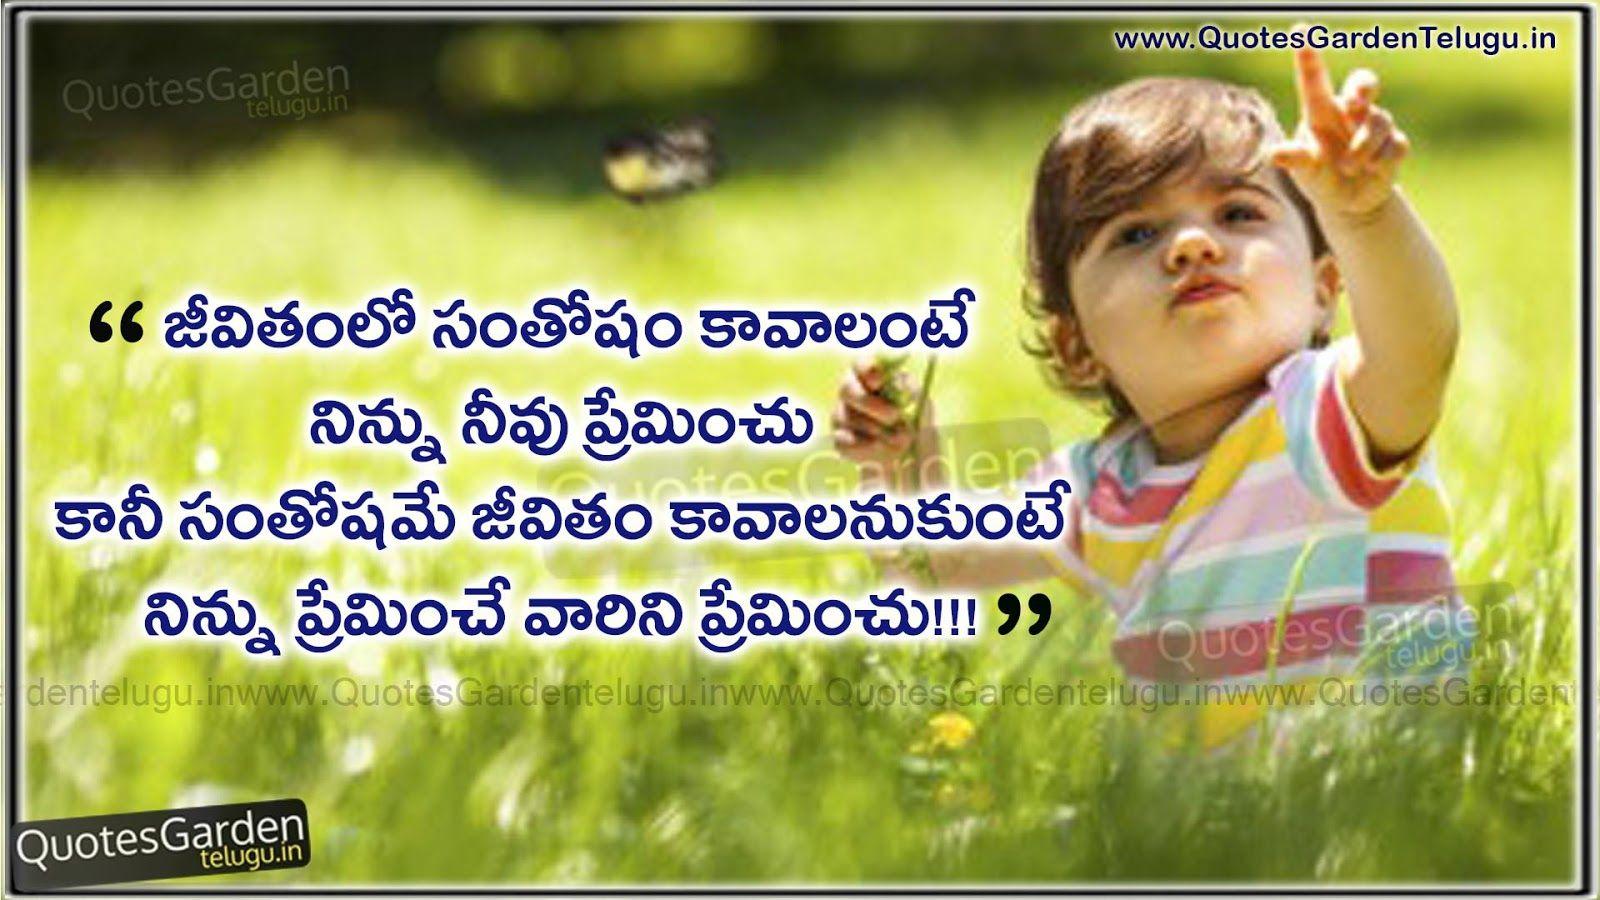 Telugu Christian Wallpapers The Christian Messenger Life Quotes Life Quotes Wallpaper New Life Quotes